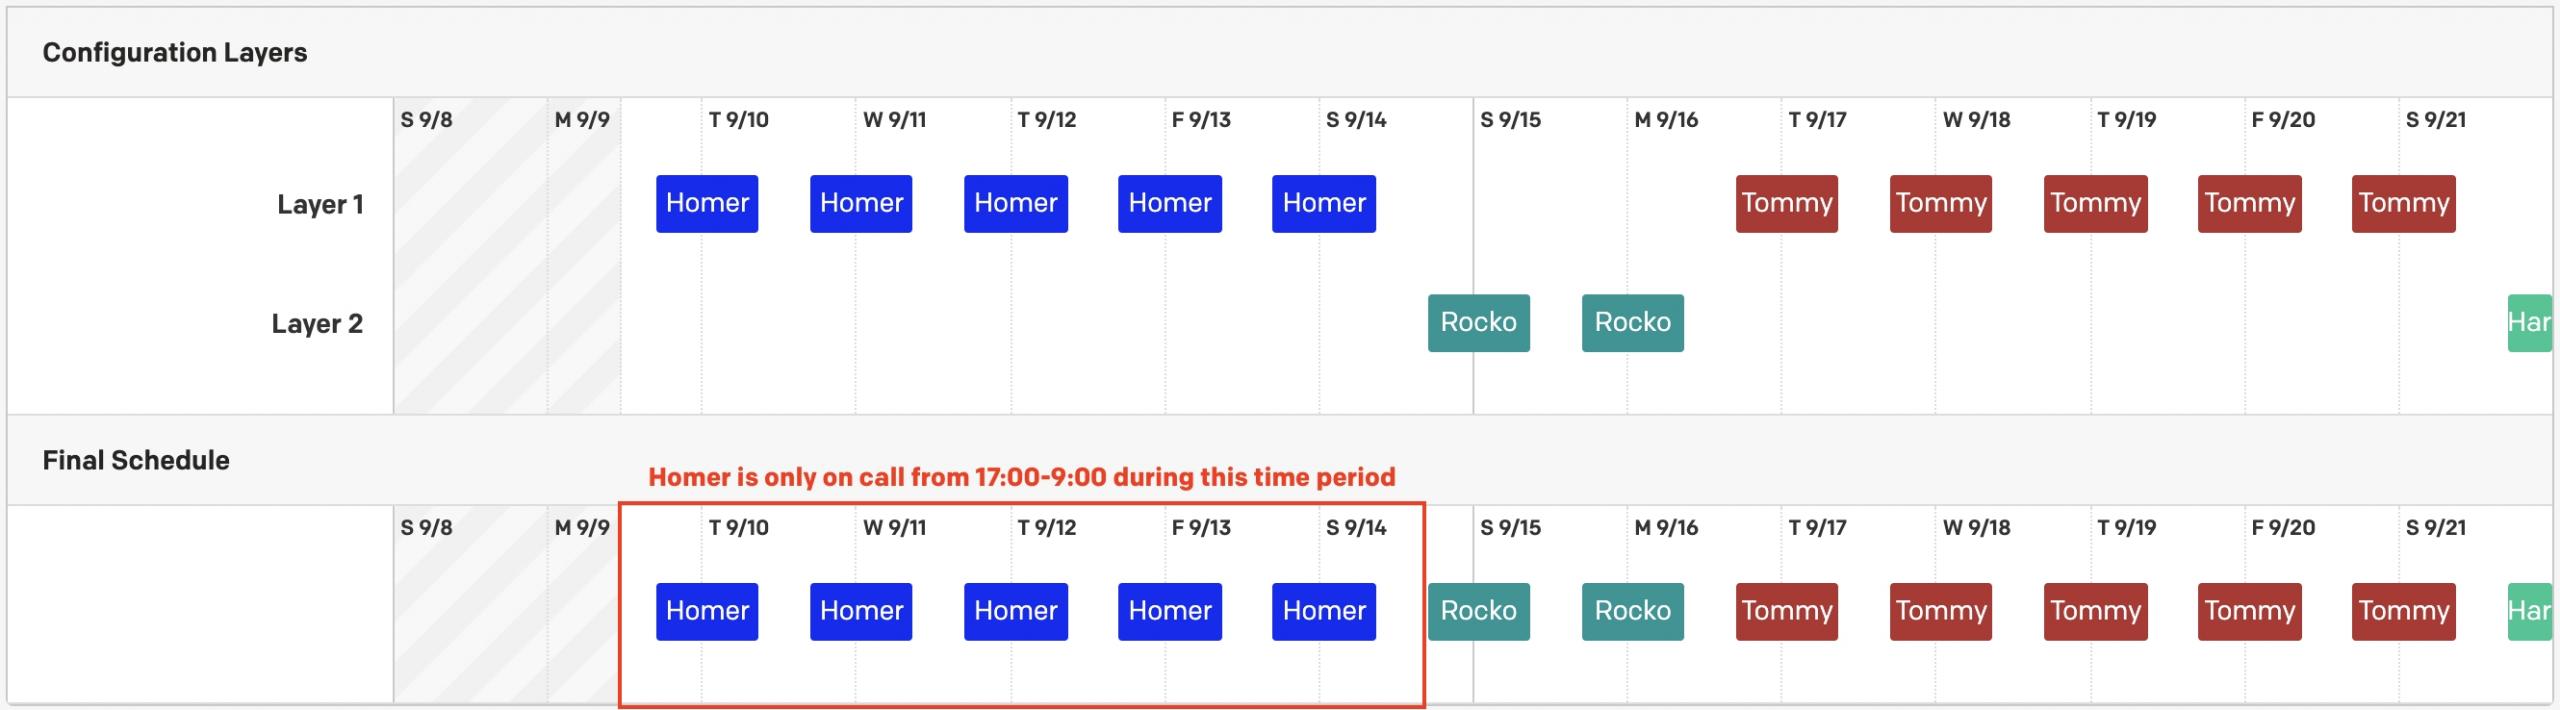 Schedule Basics